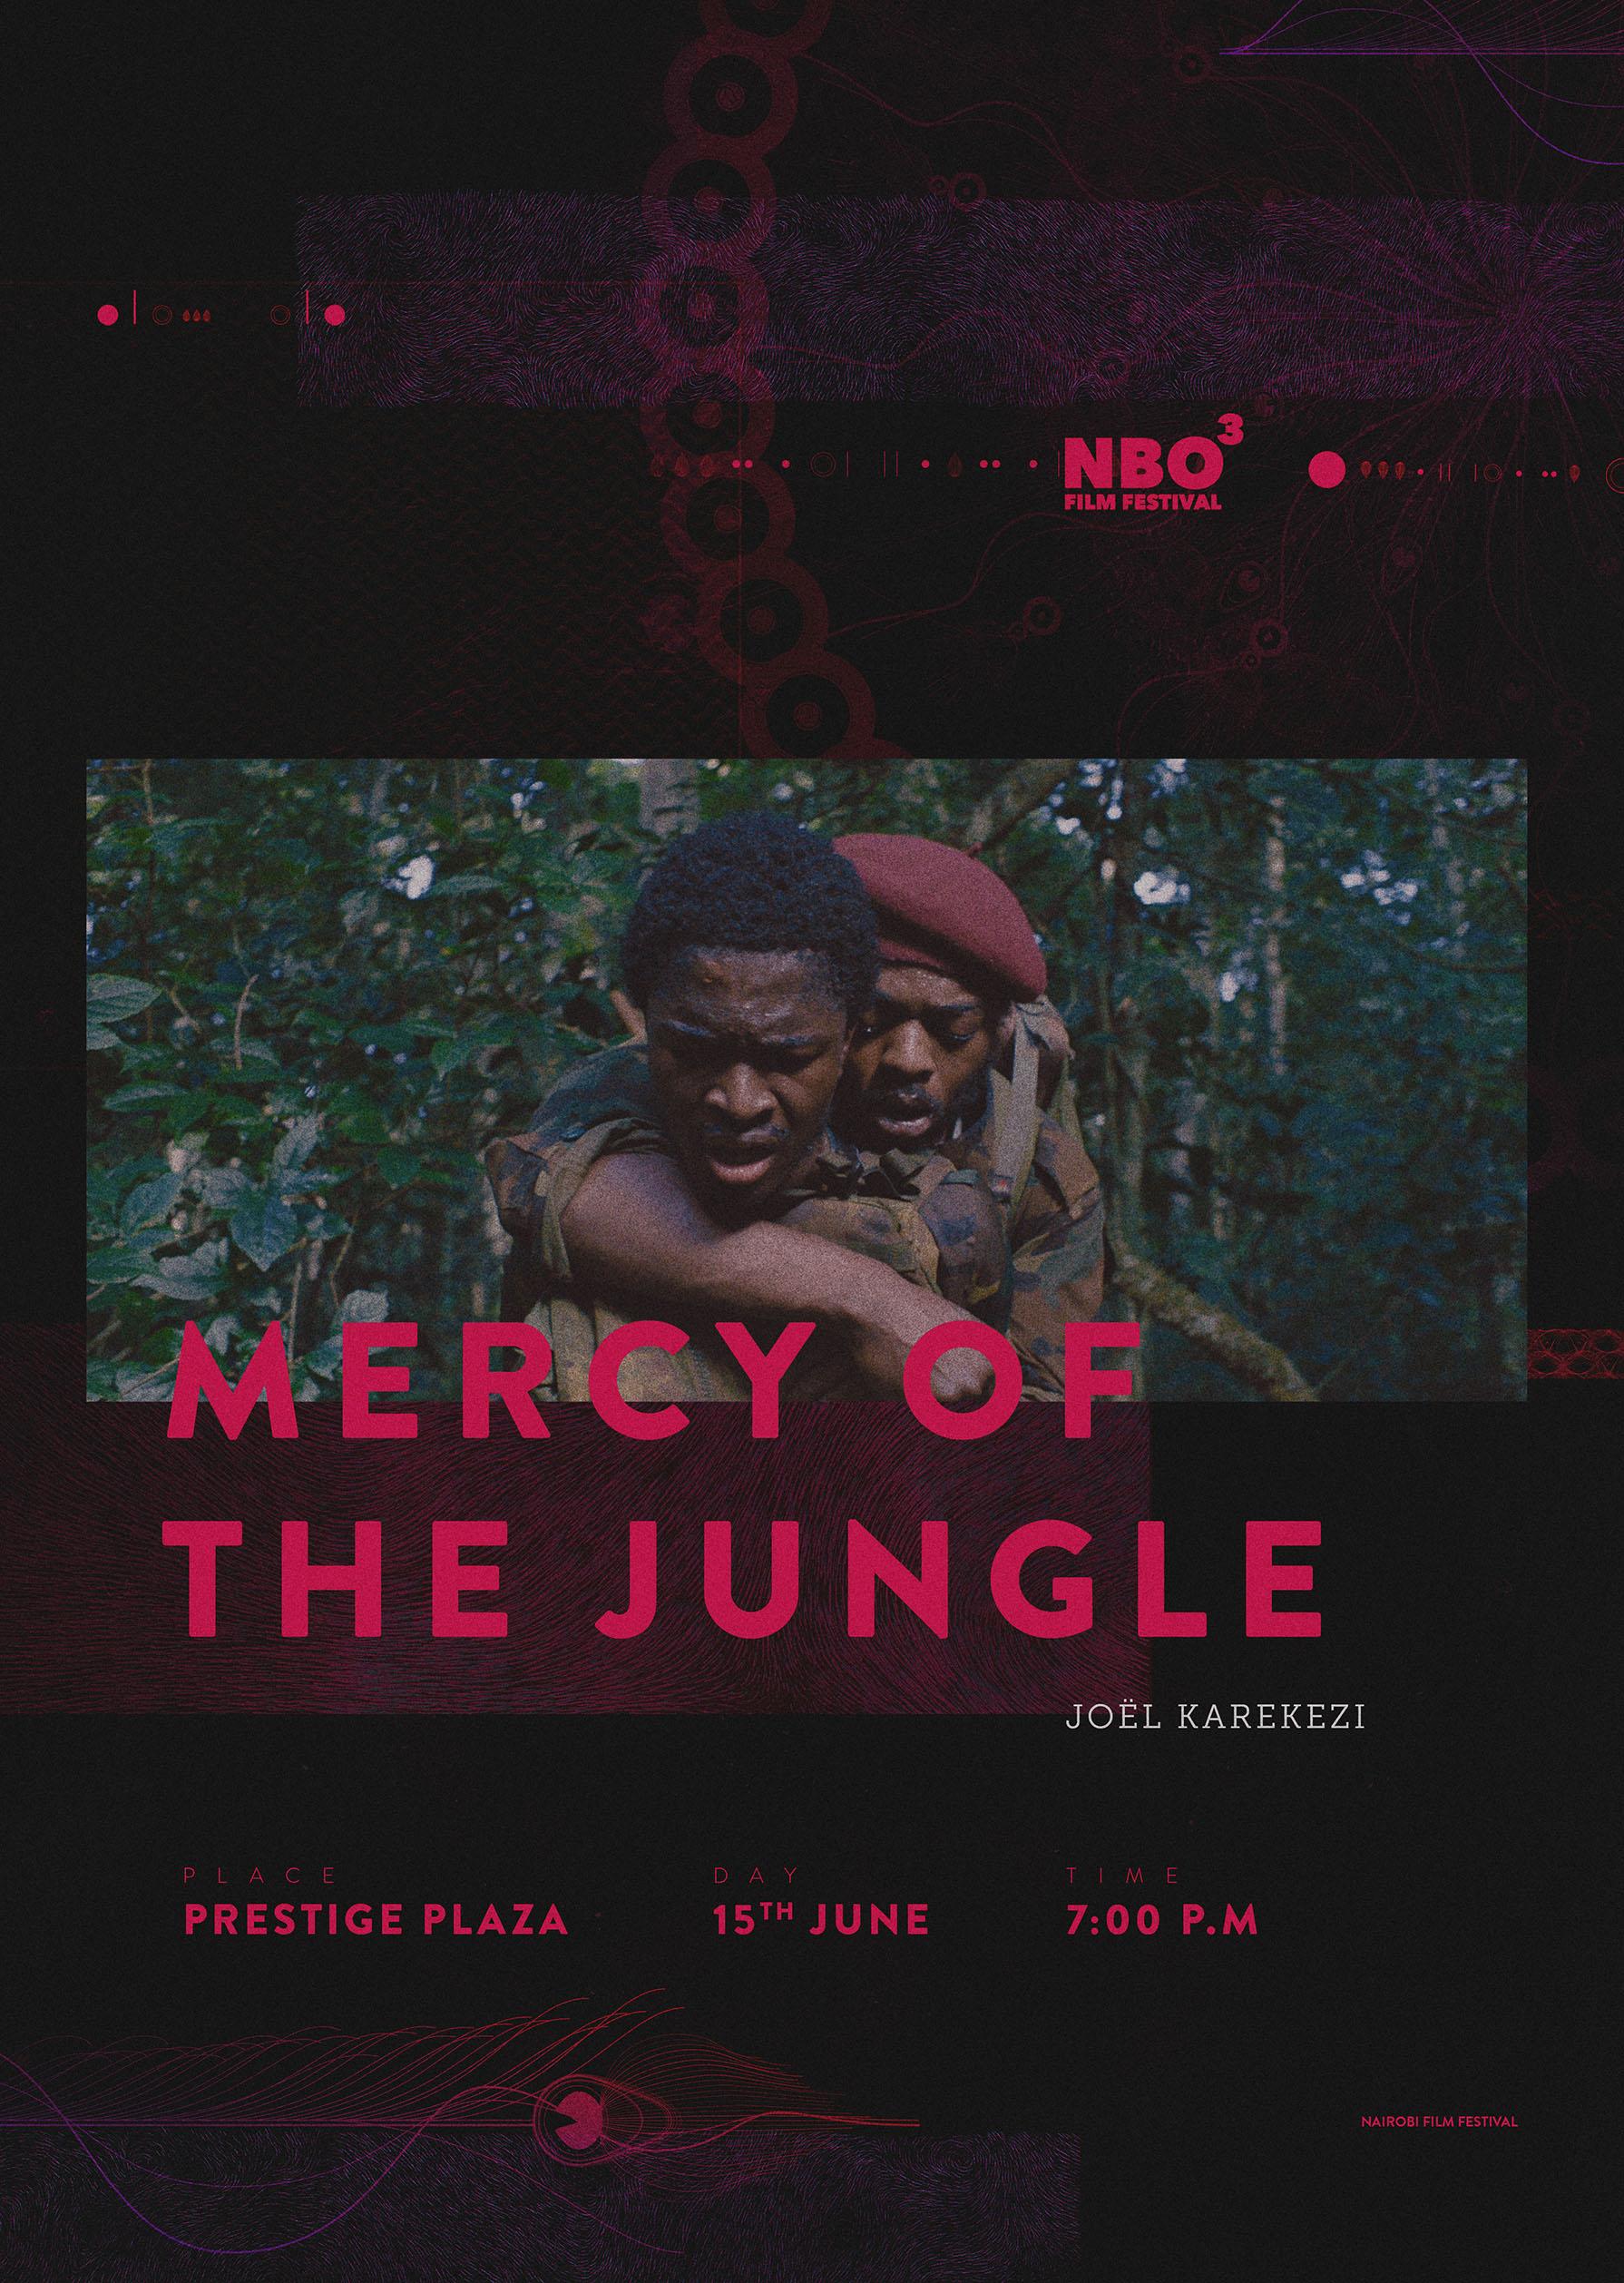 mercy of the jungle A3 jpeg.jpg